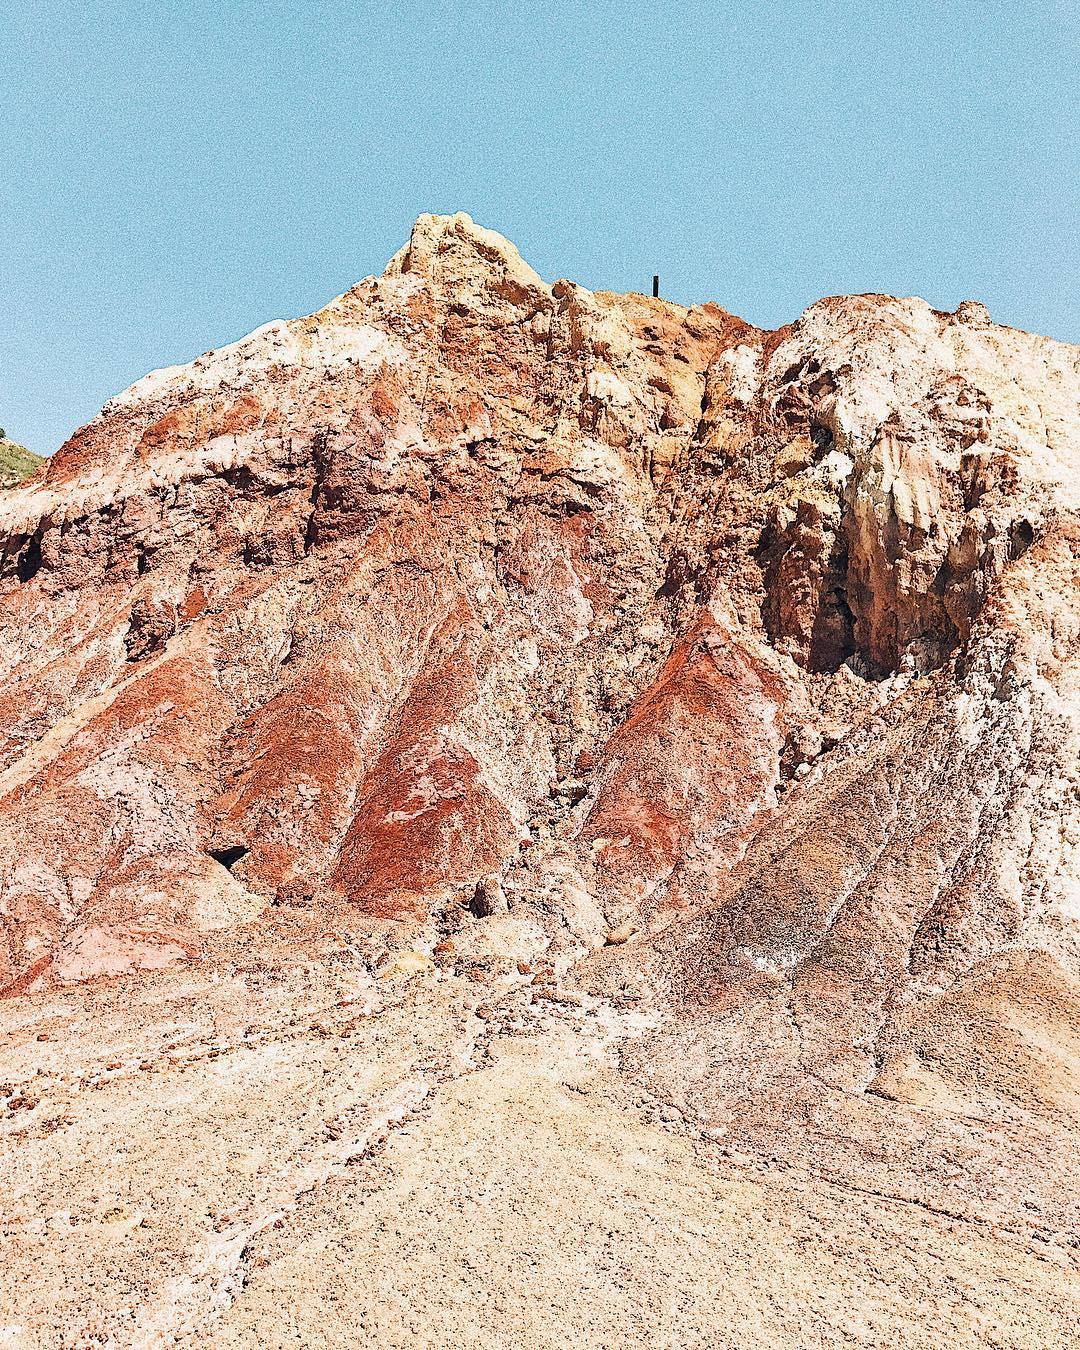 fotografo Joaquin Lucas paleta de colores de Wes Anderson  (43)